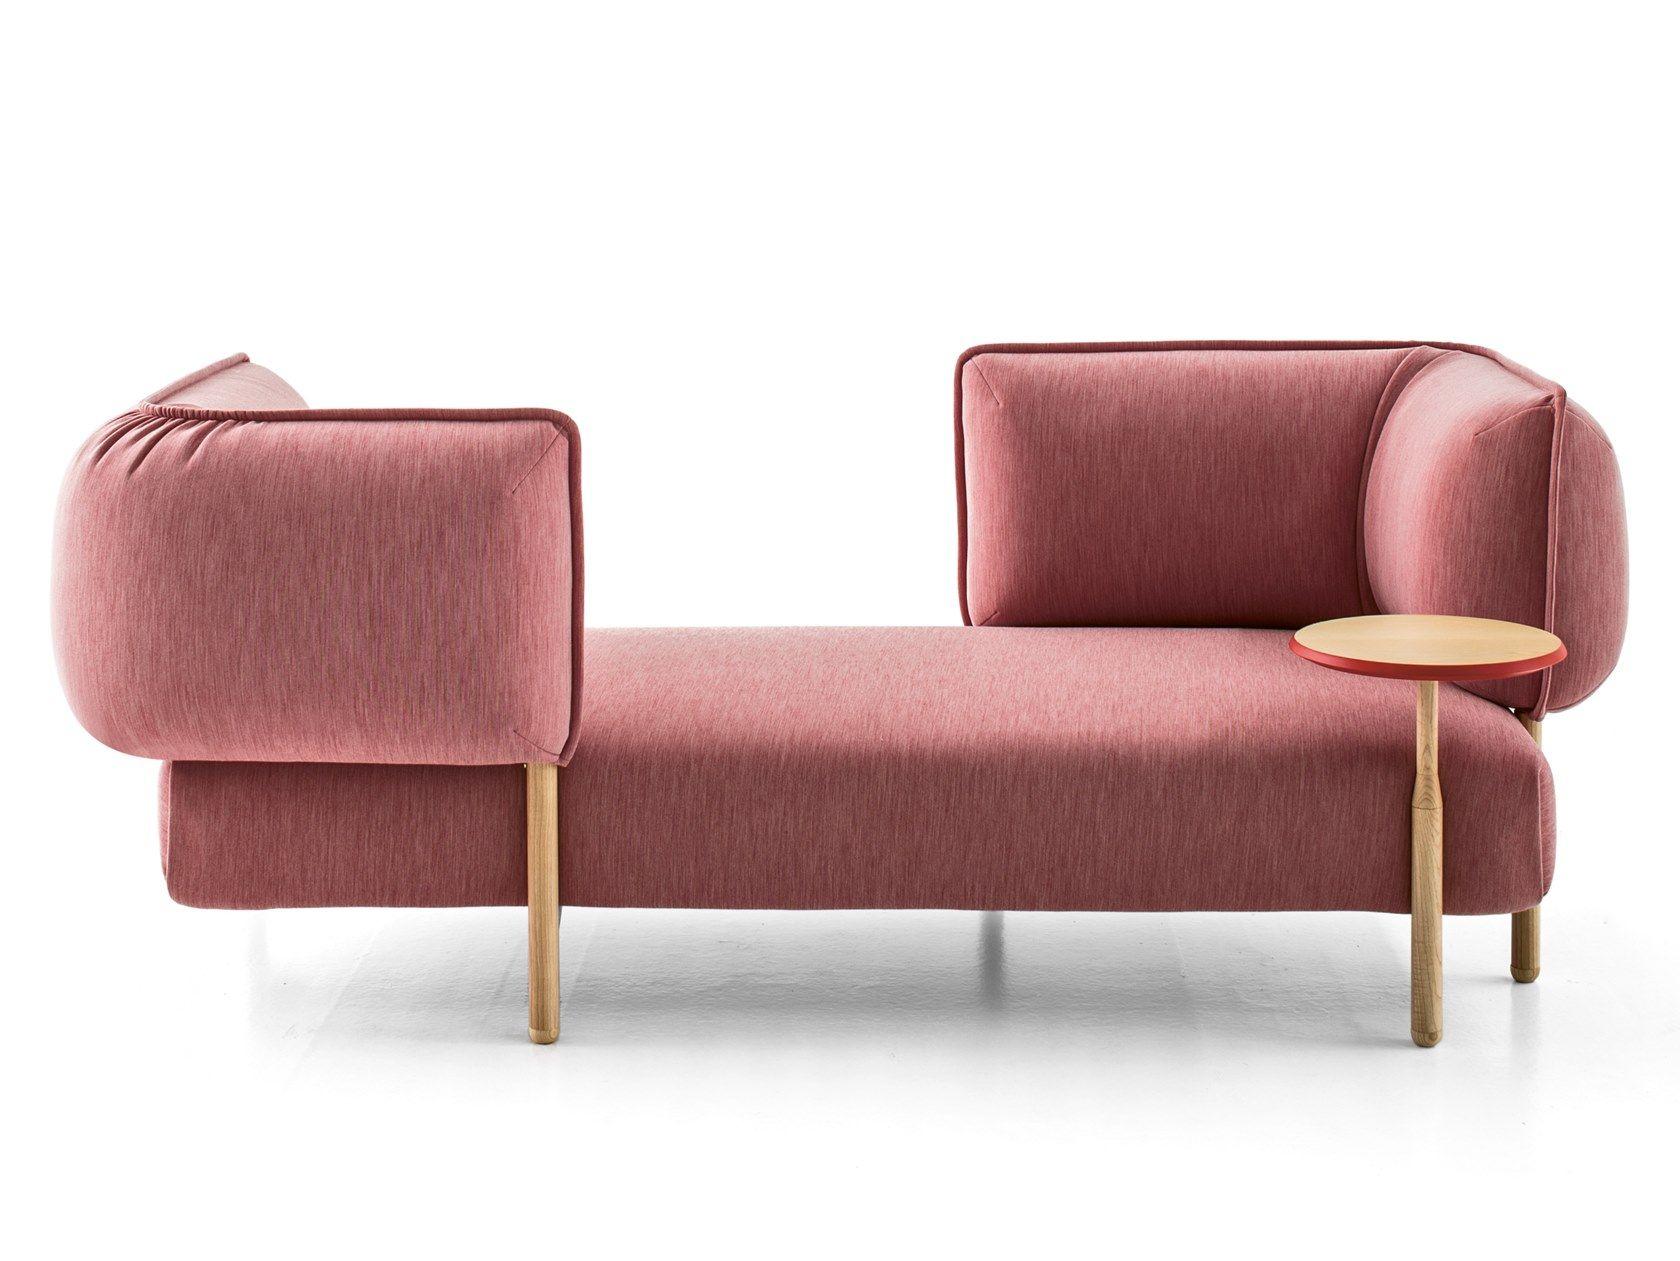 2 Seater Fabric Sofa Tender Vis A Vismoroso Design Throughout Cohutta Armchairs (View 13 of 15)